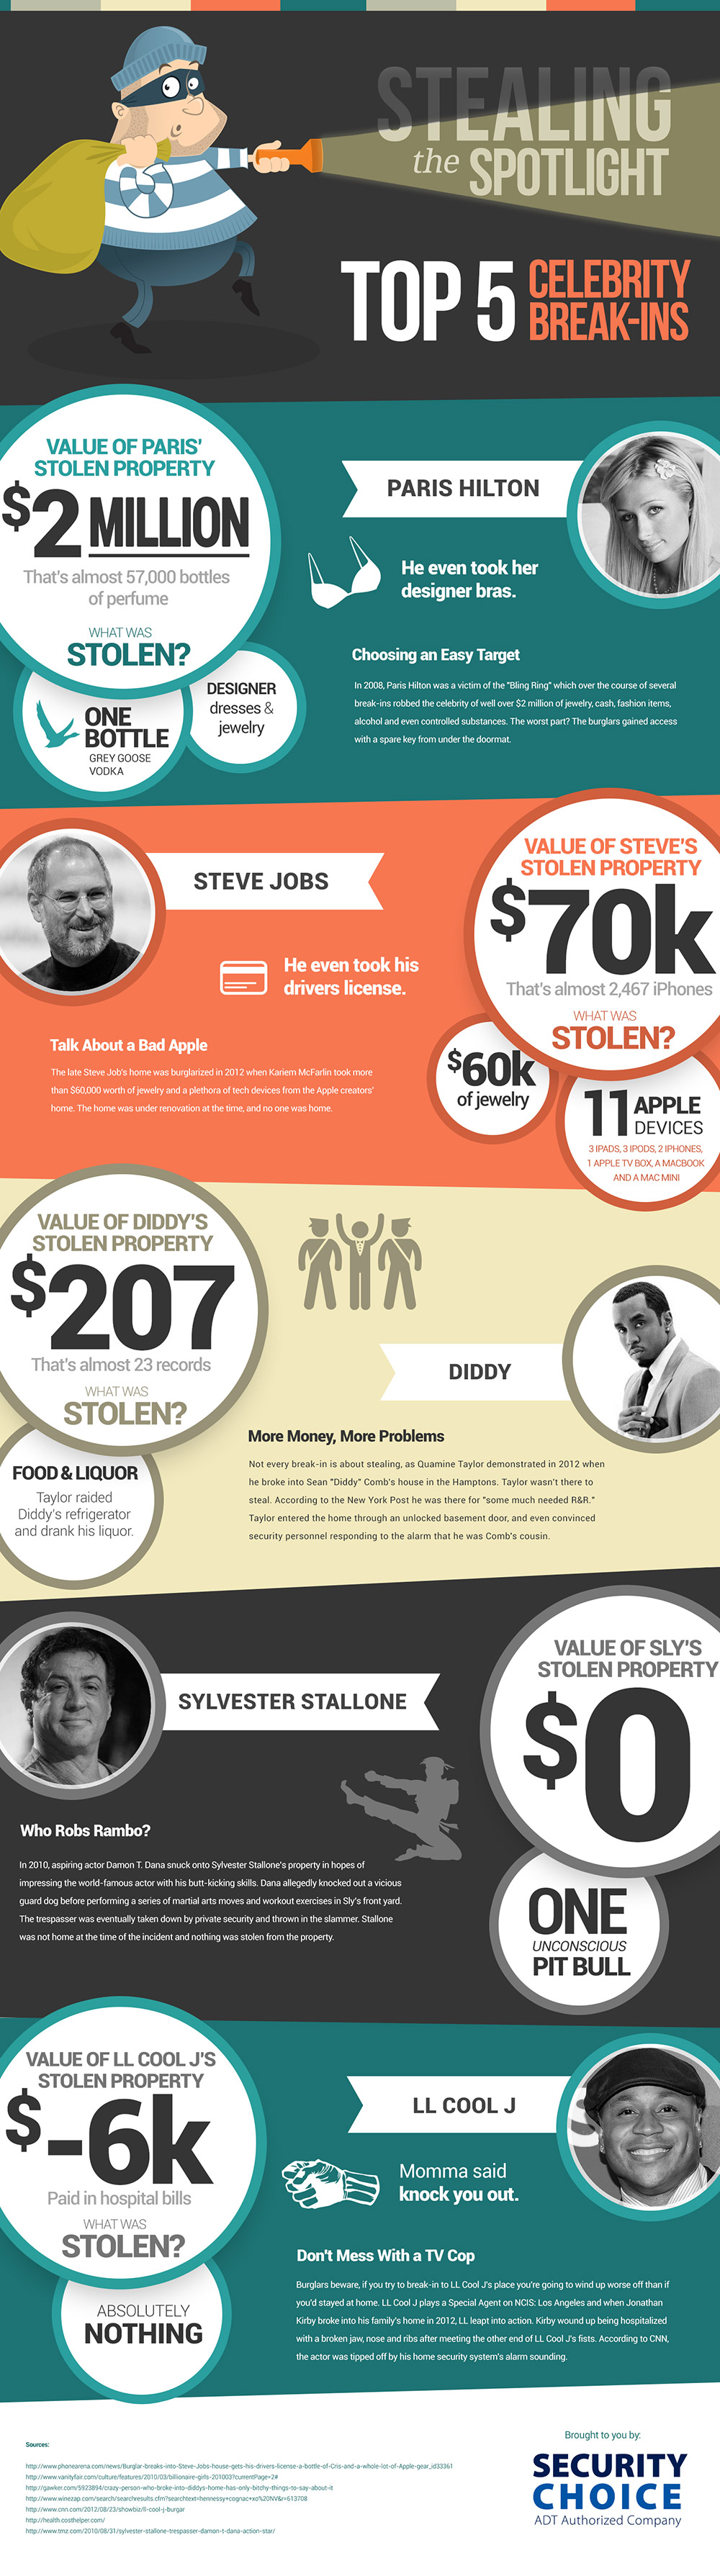 Celebrities Burglaries-Infographic